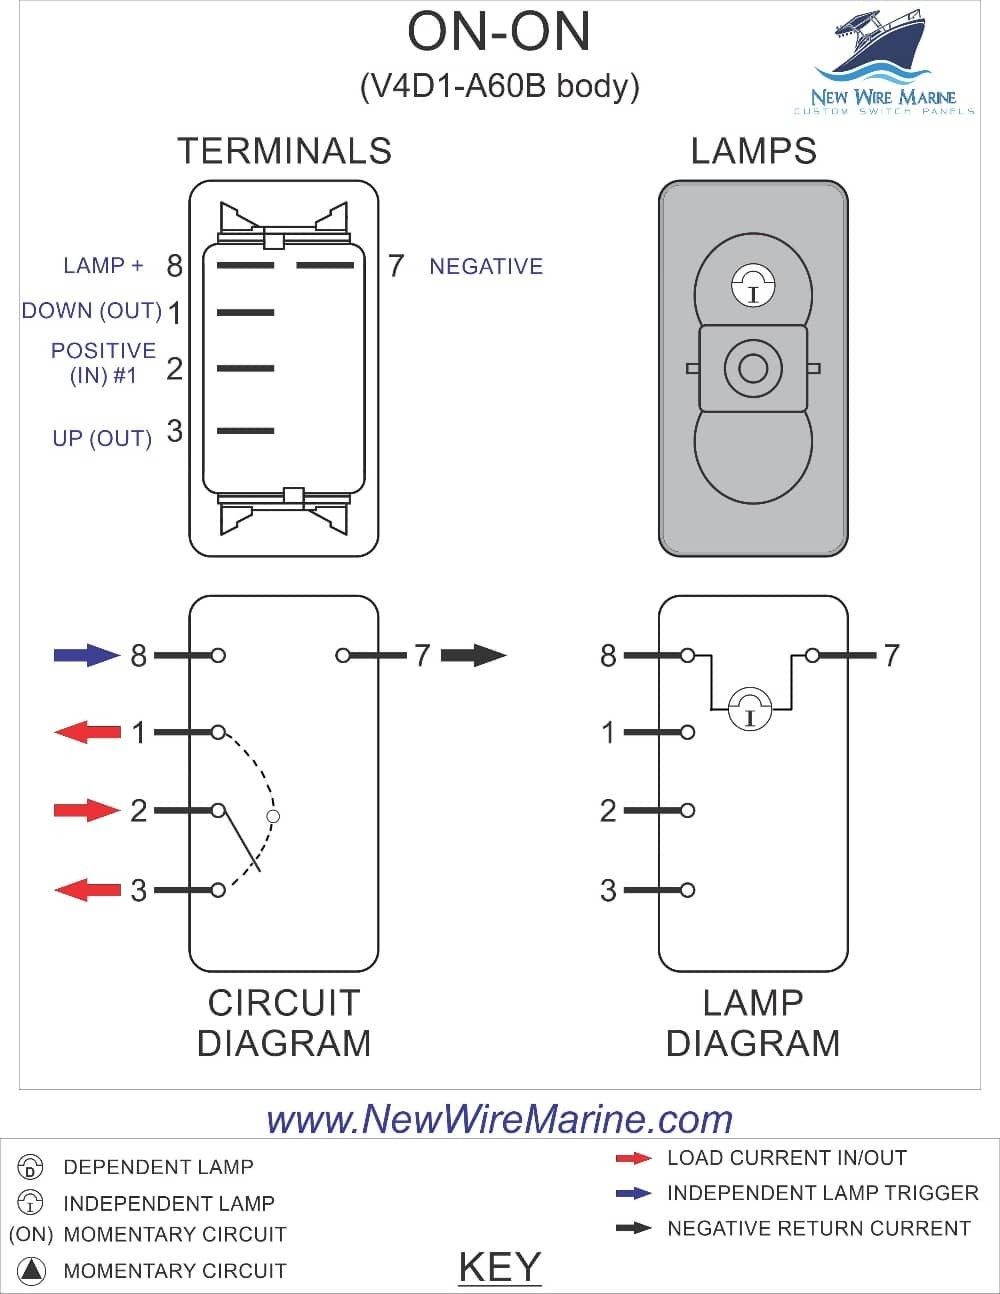 medium resolution of 1999 dodge caravan fuse diagram http wwwpic2flycom 1999dodge wire rh dxruptive co